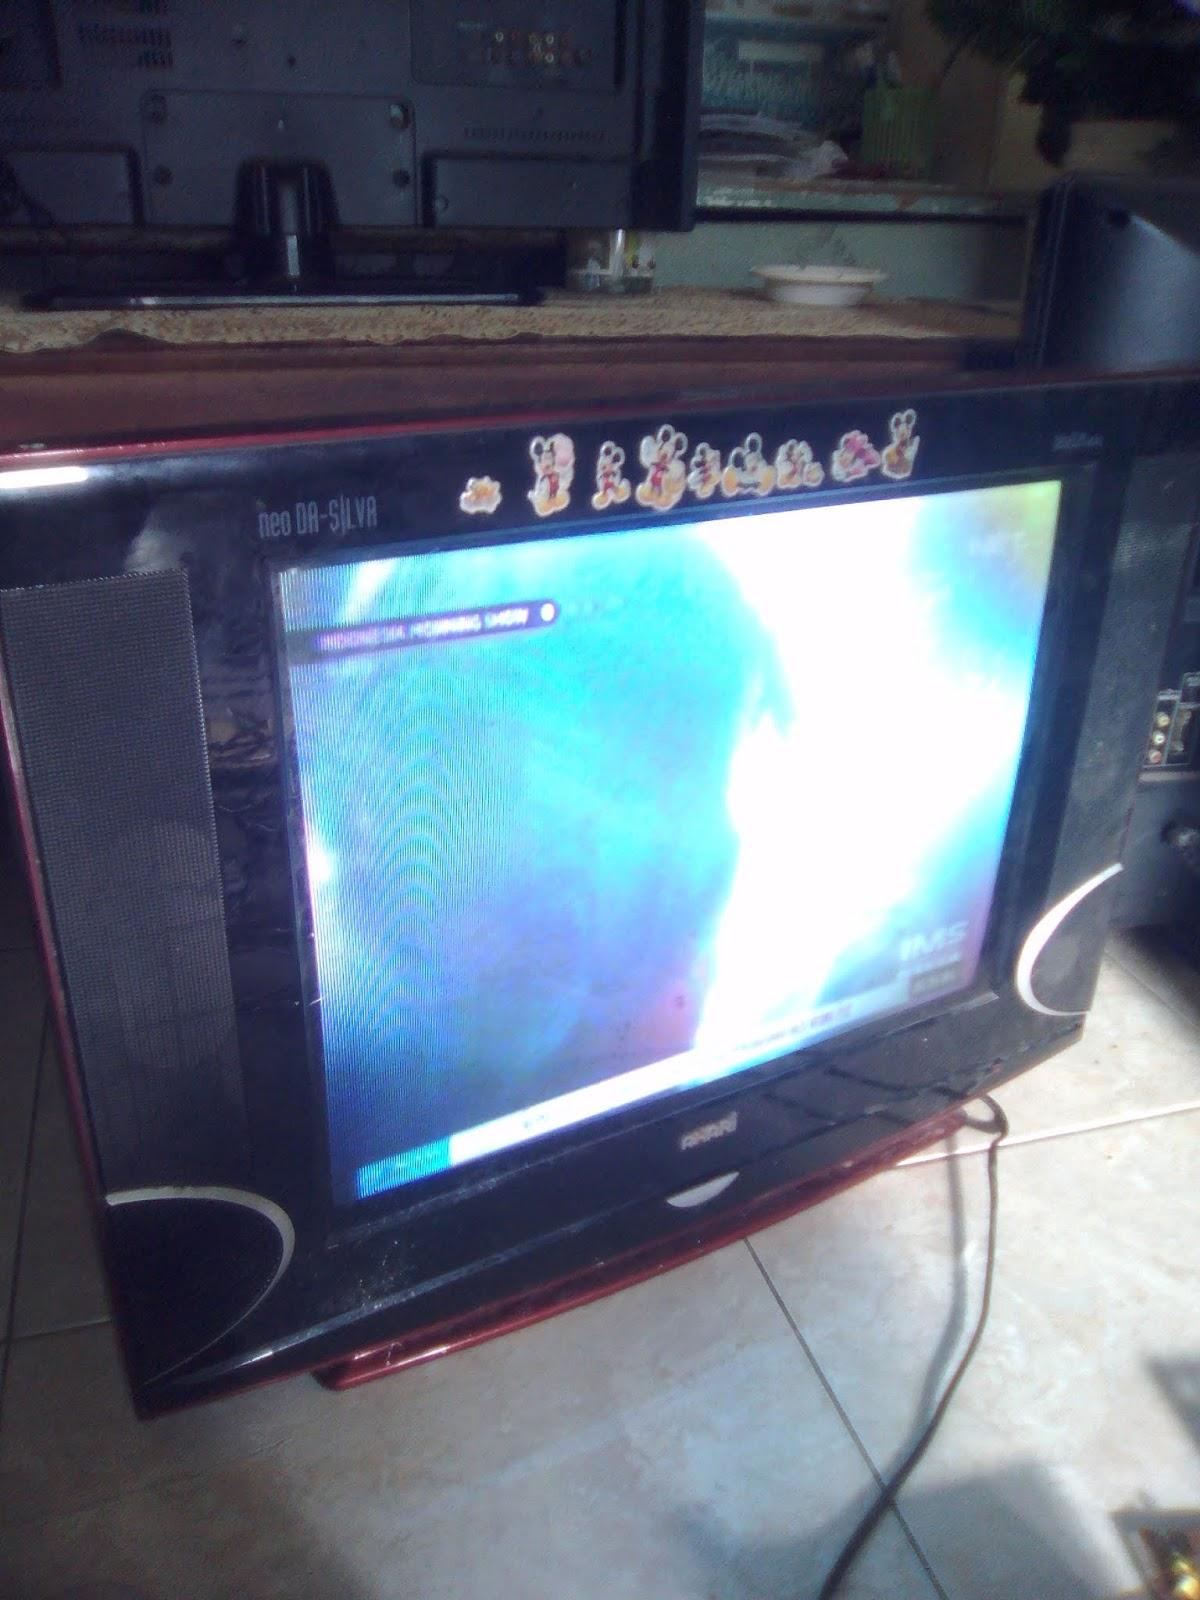 Belajar Elektronik Sederhana Tv Akari Flat Slim Tidak Ada Suara